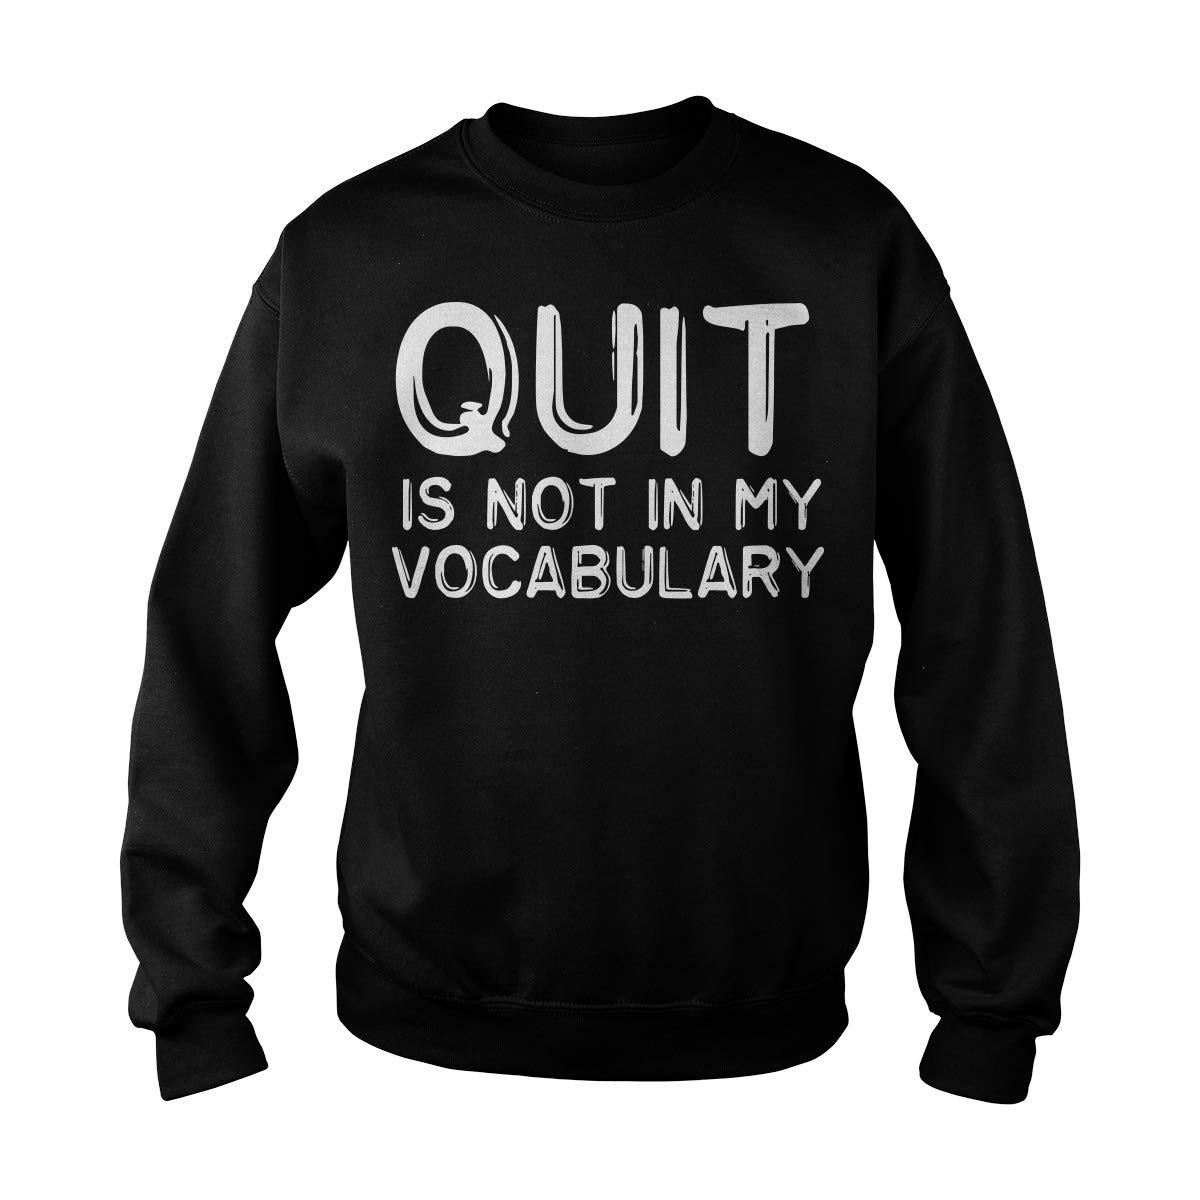 Quit is Not in My Vocabulary Adult Crewneck Sweatshirt